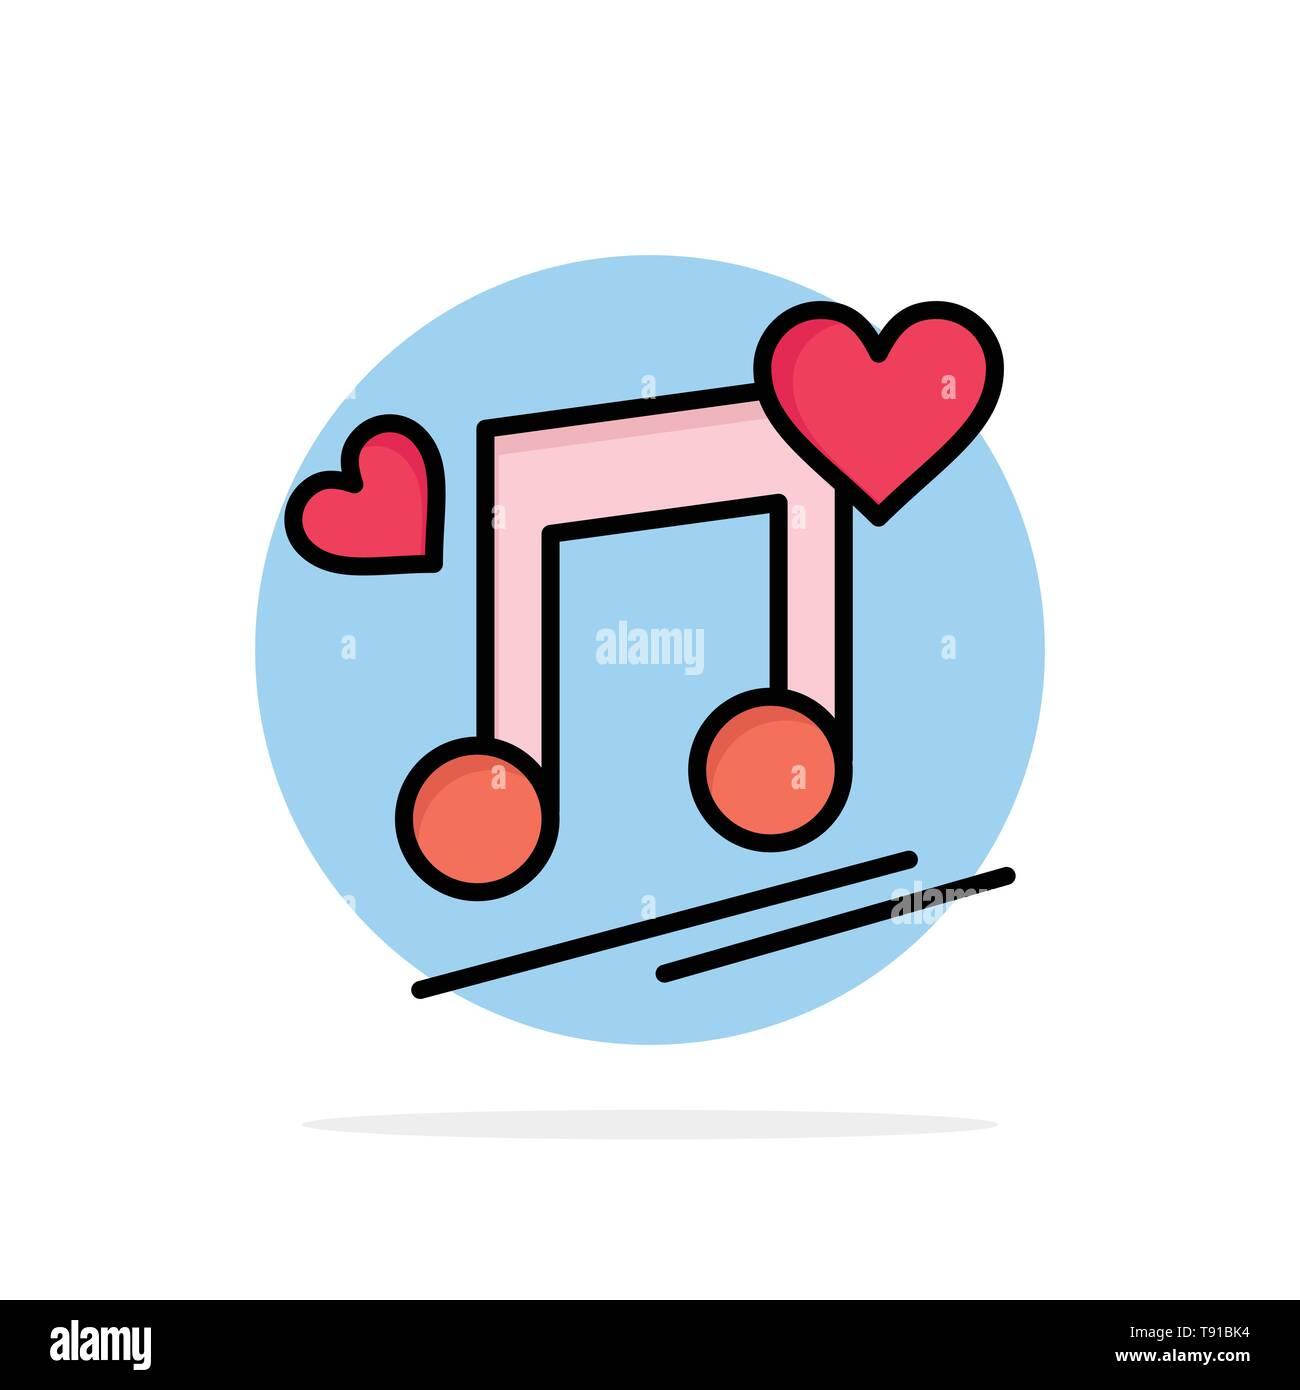 Music Node, Node, Lyrics, Love, Song Abstract Circle